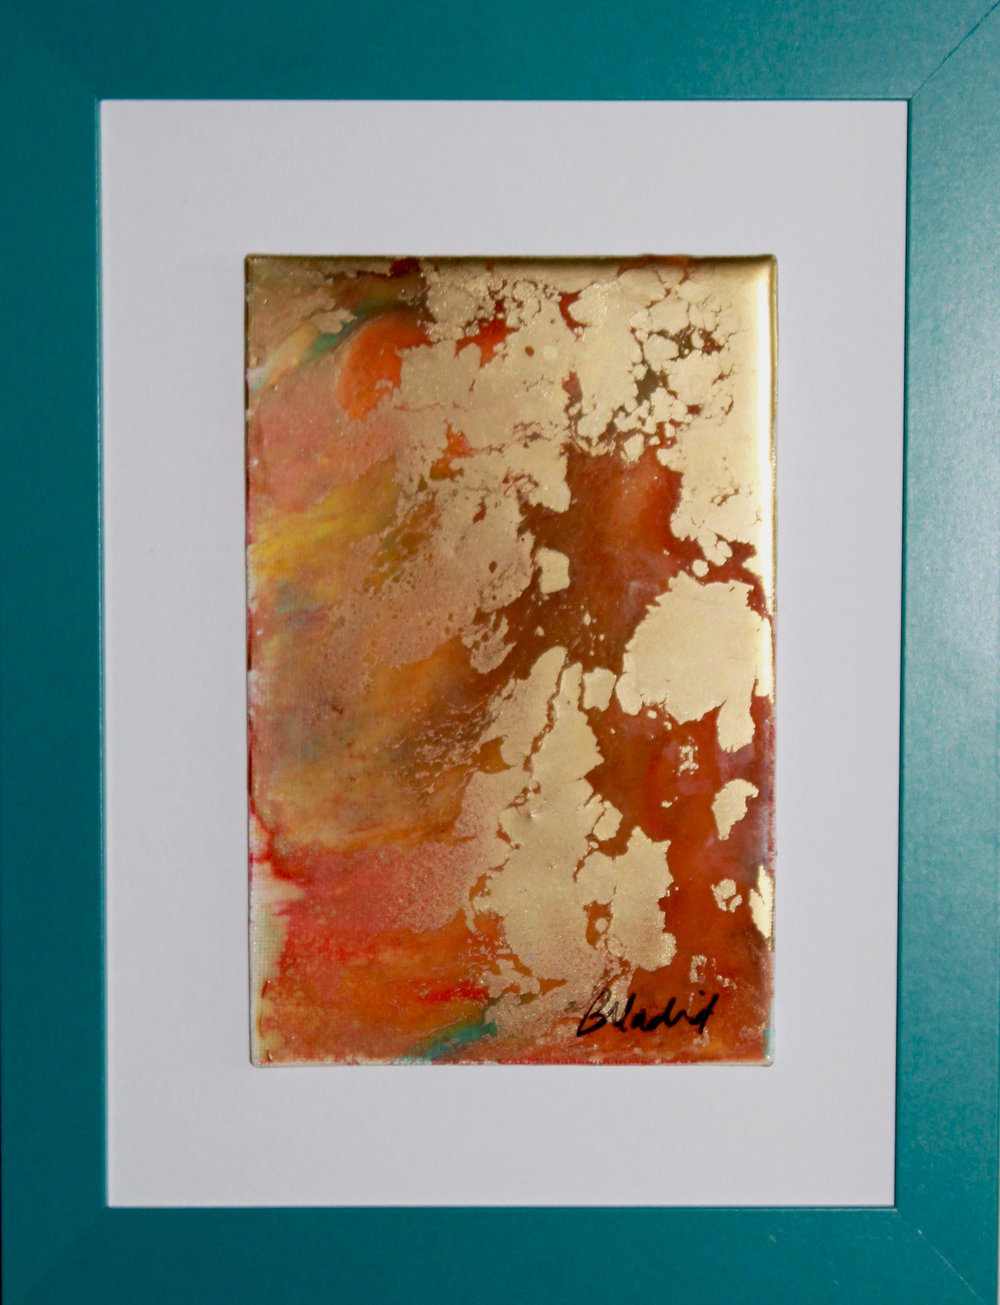 "San Pedro | 11.5"" x 9.5"" framed canvas"